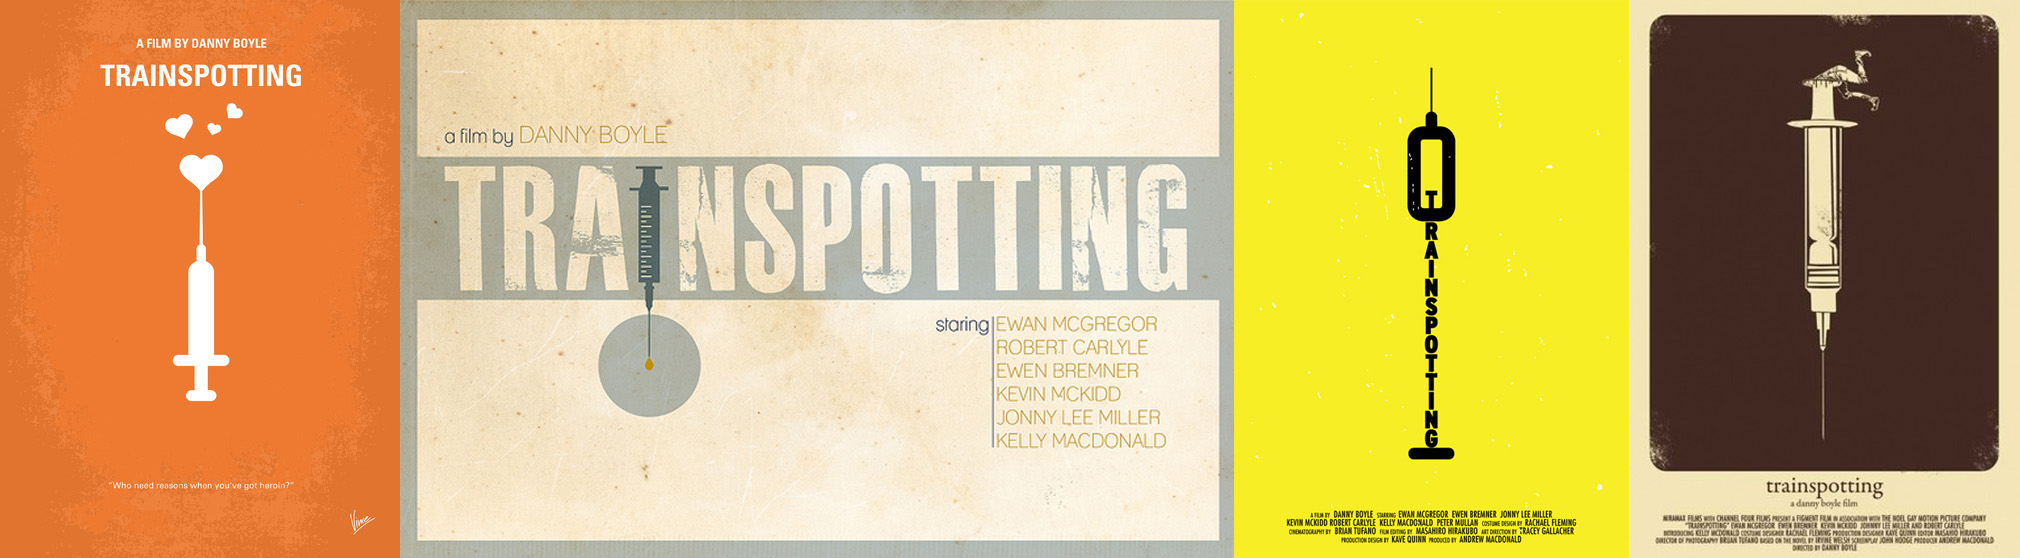 Trainspotting Poster Minimalist Trainspotting – Minimalist